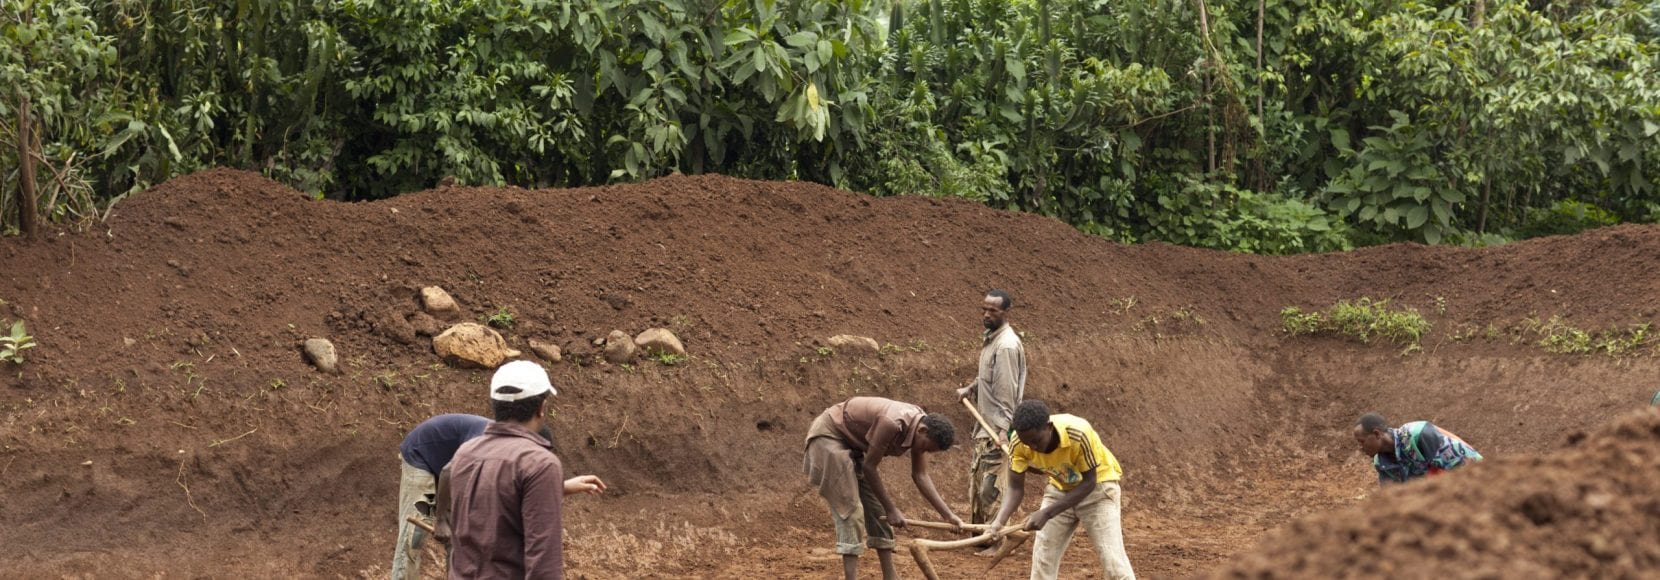 Coffee farmers in Ethiopia